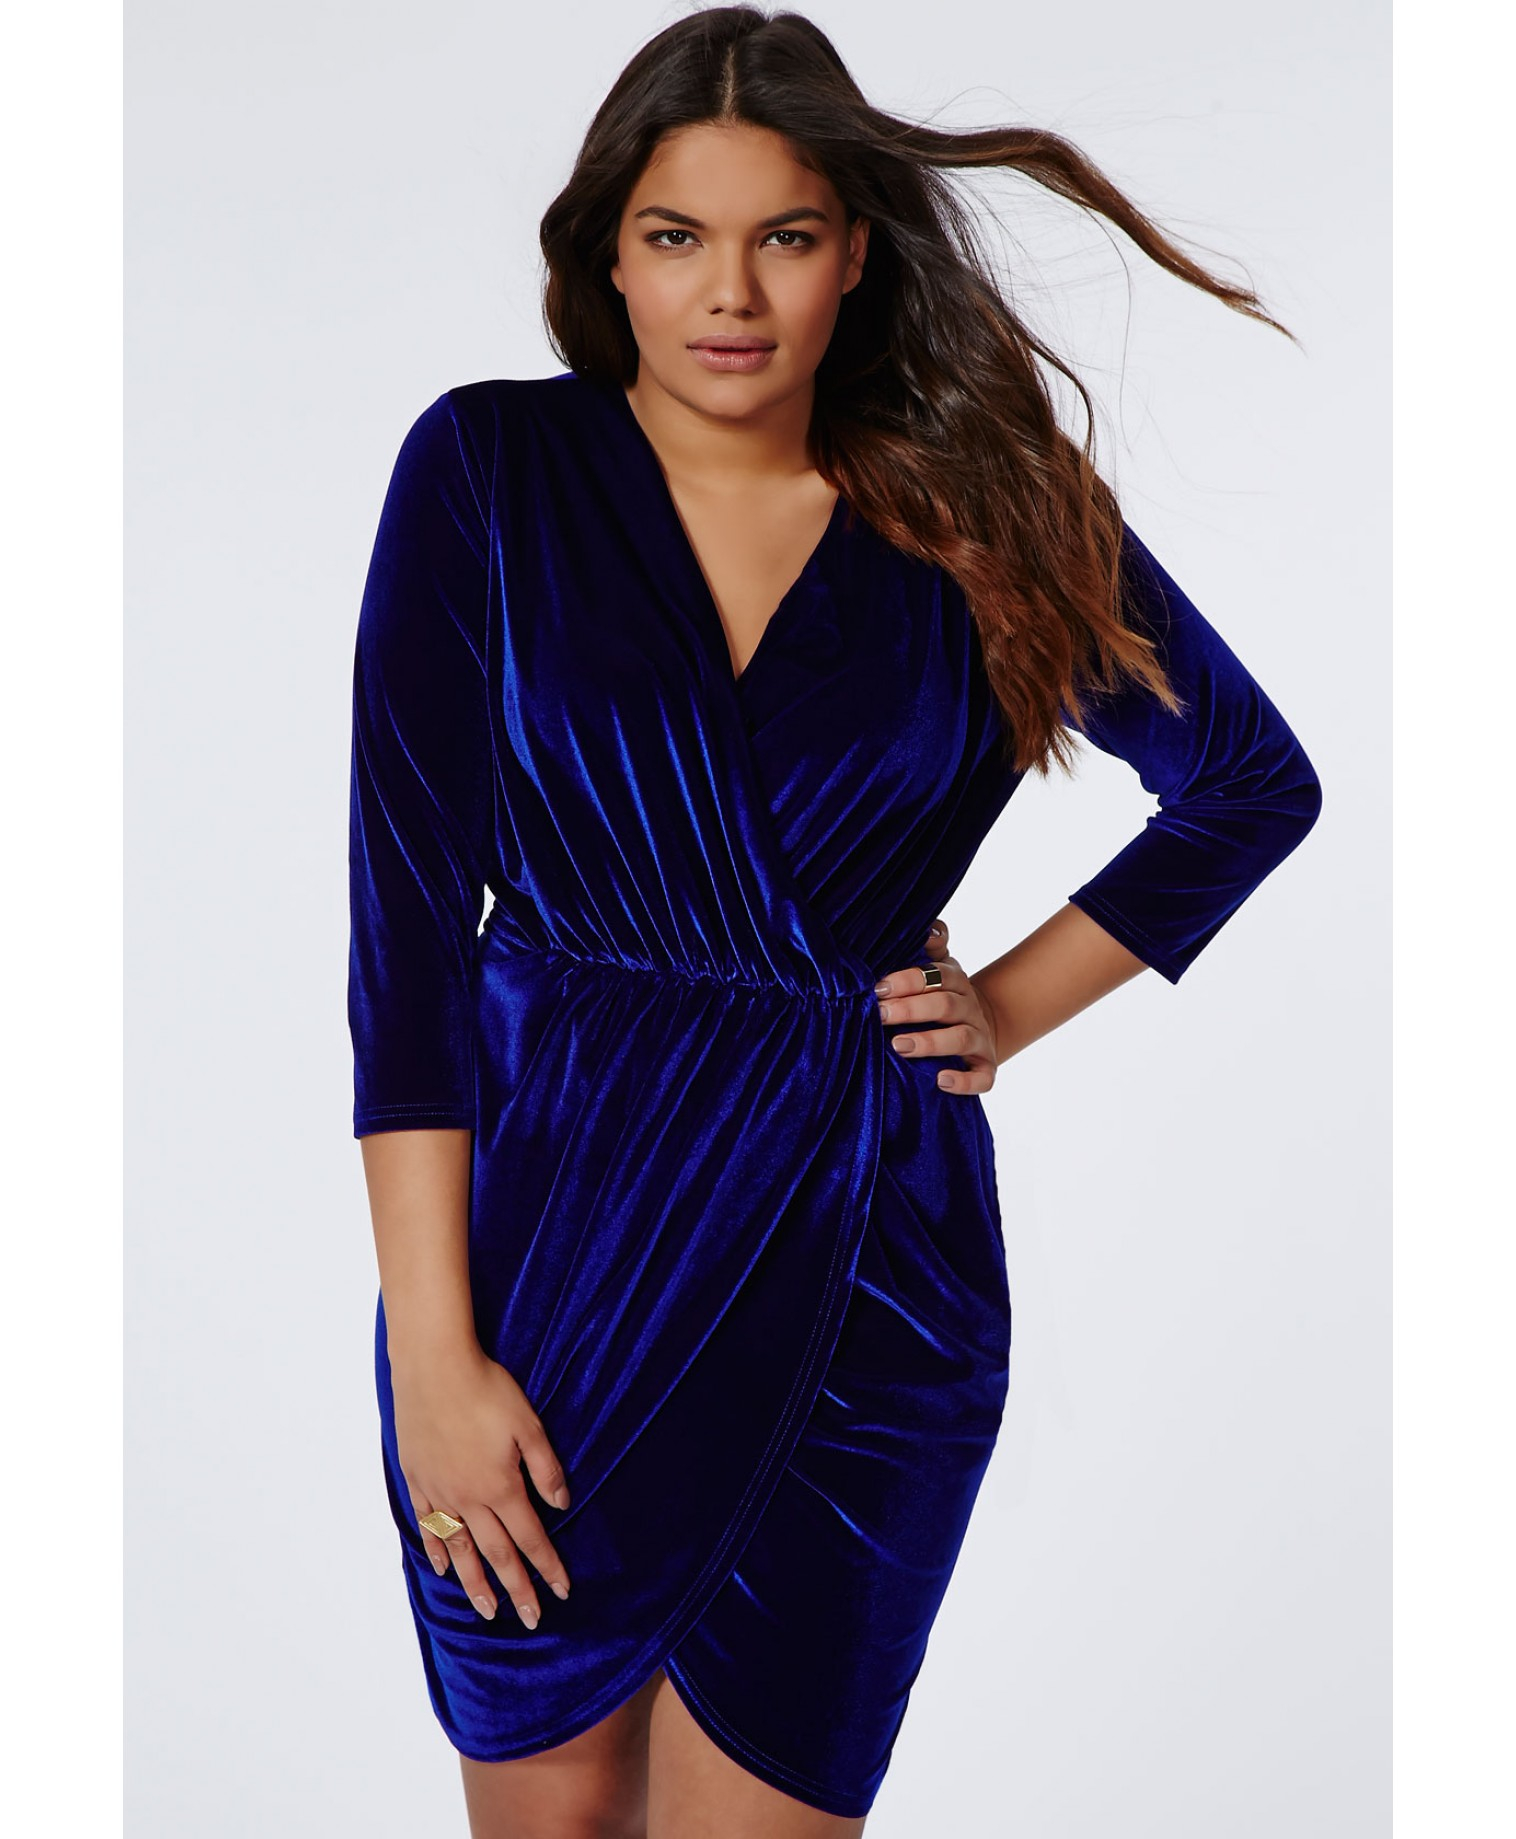 Velvet Plus Size Dresses Plus Size Tops